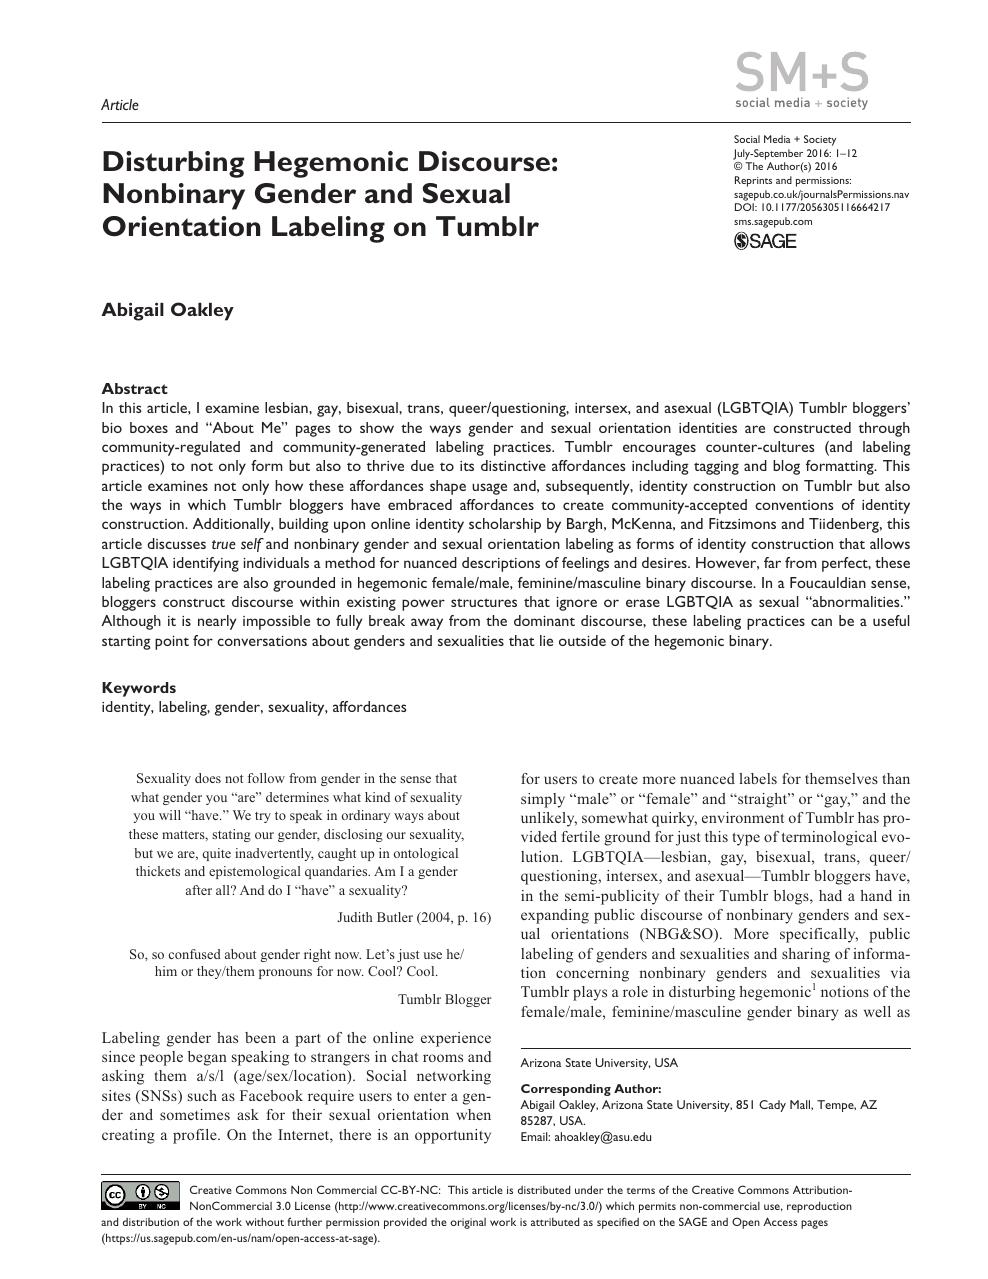 Disturbing Hegemonic Discourse: Nonbinary Gender and Sexual